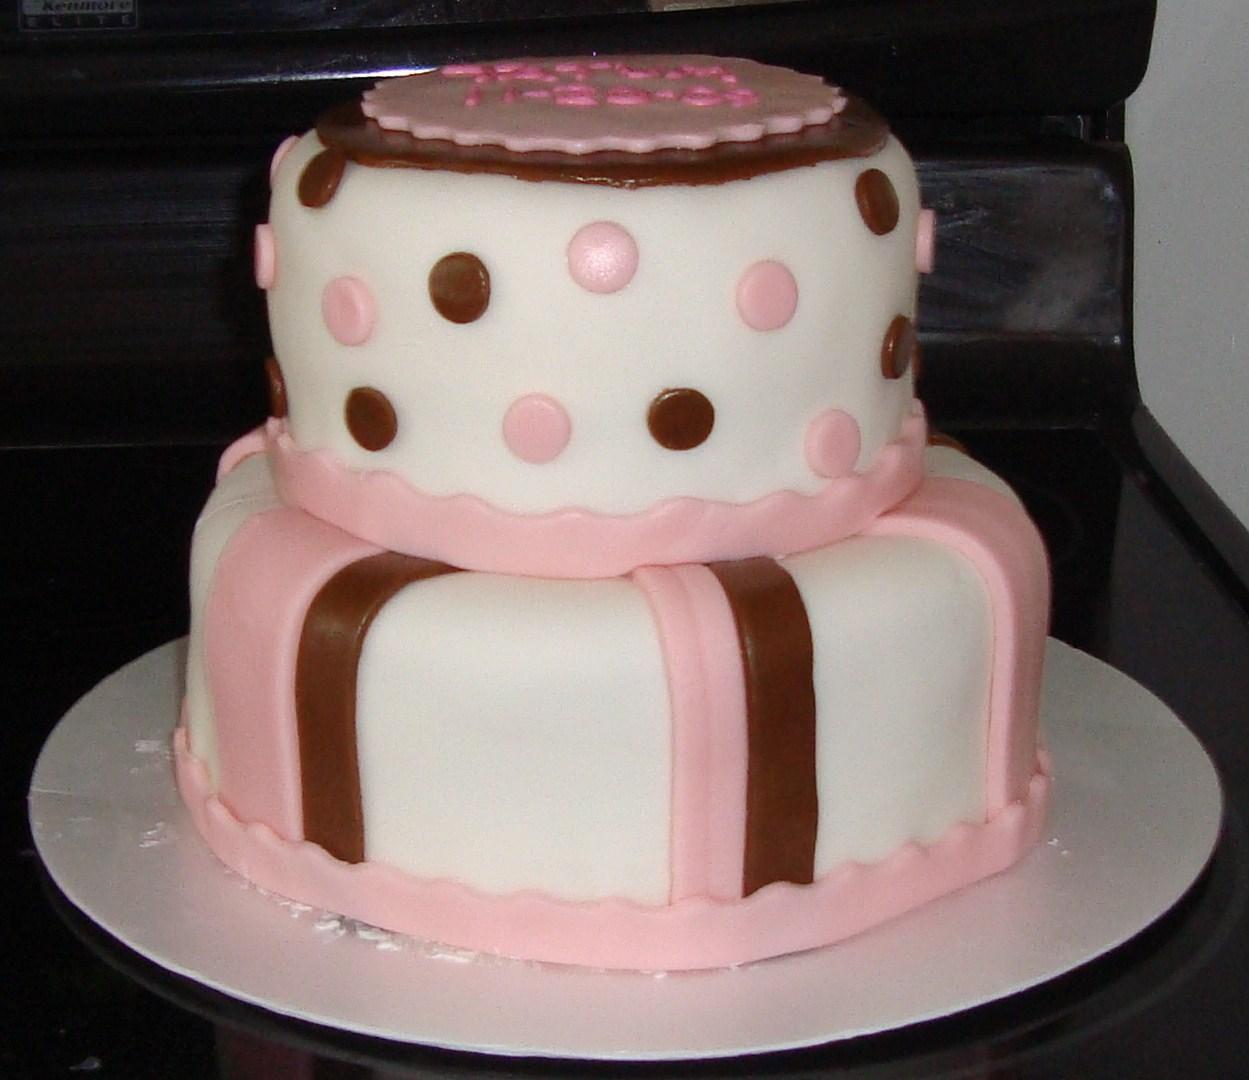 Cakes By Alissa: Baby Shower Cake for Baby Tatum November 2009